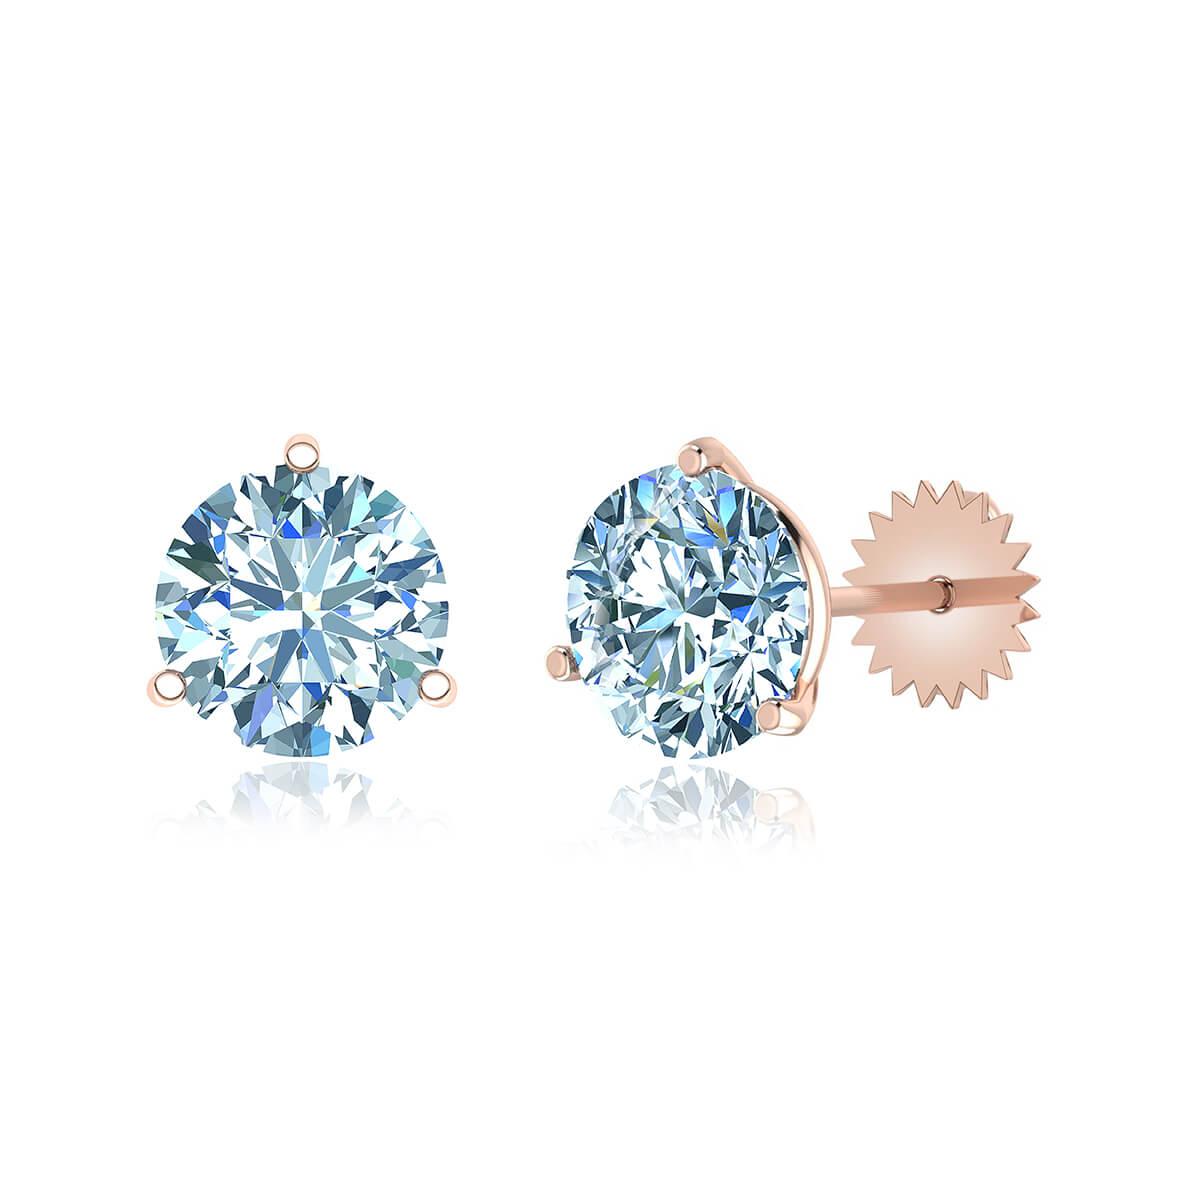 Camelopardalis Diamond Earrings  (1 CT. TW.)